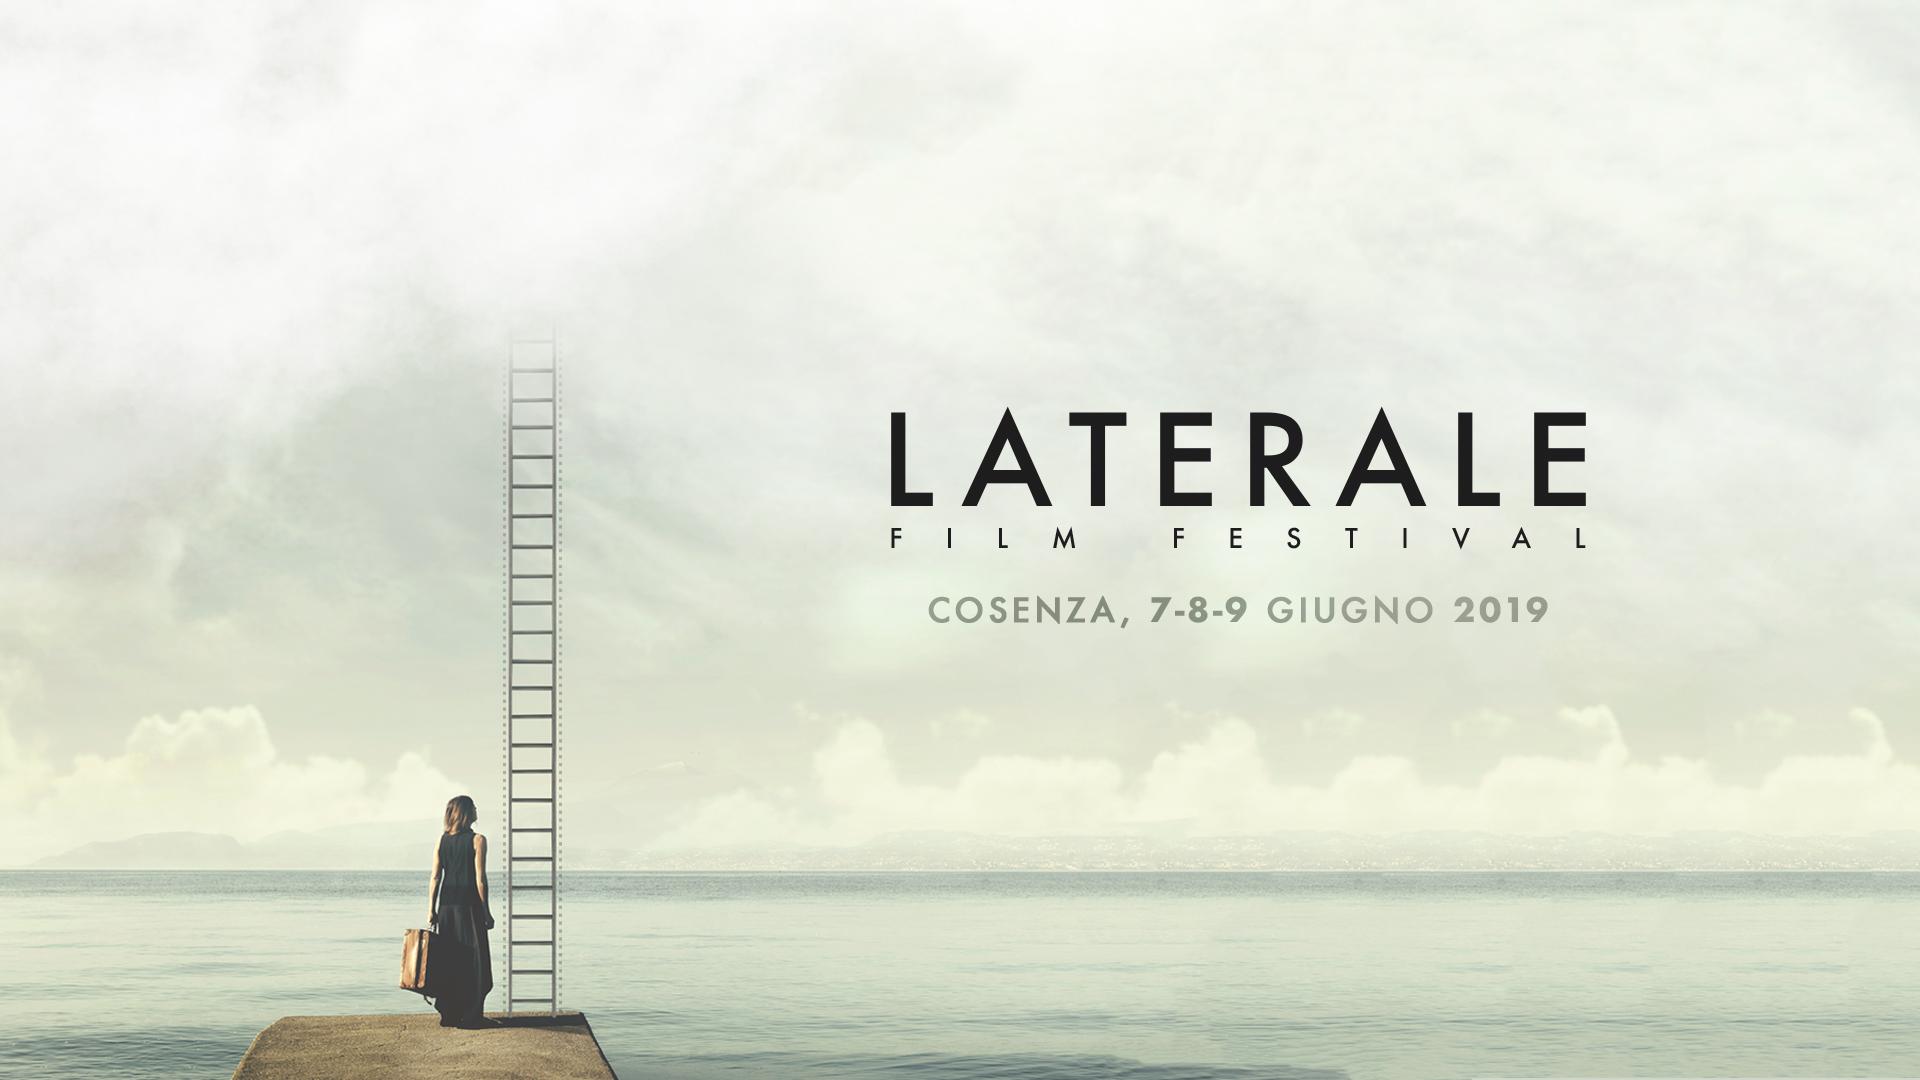 Laterale Film Fest 2019